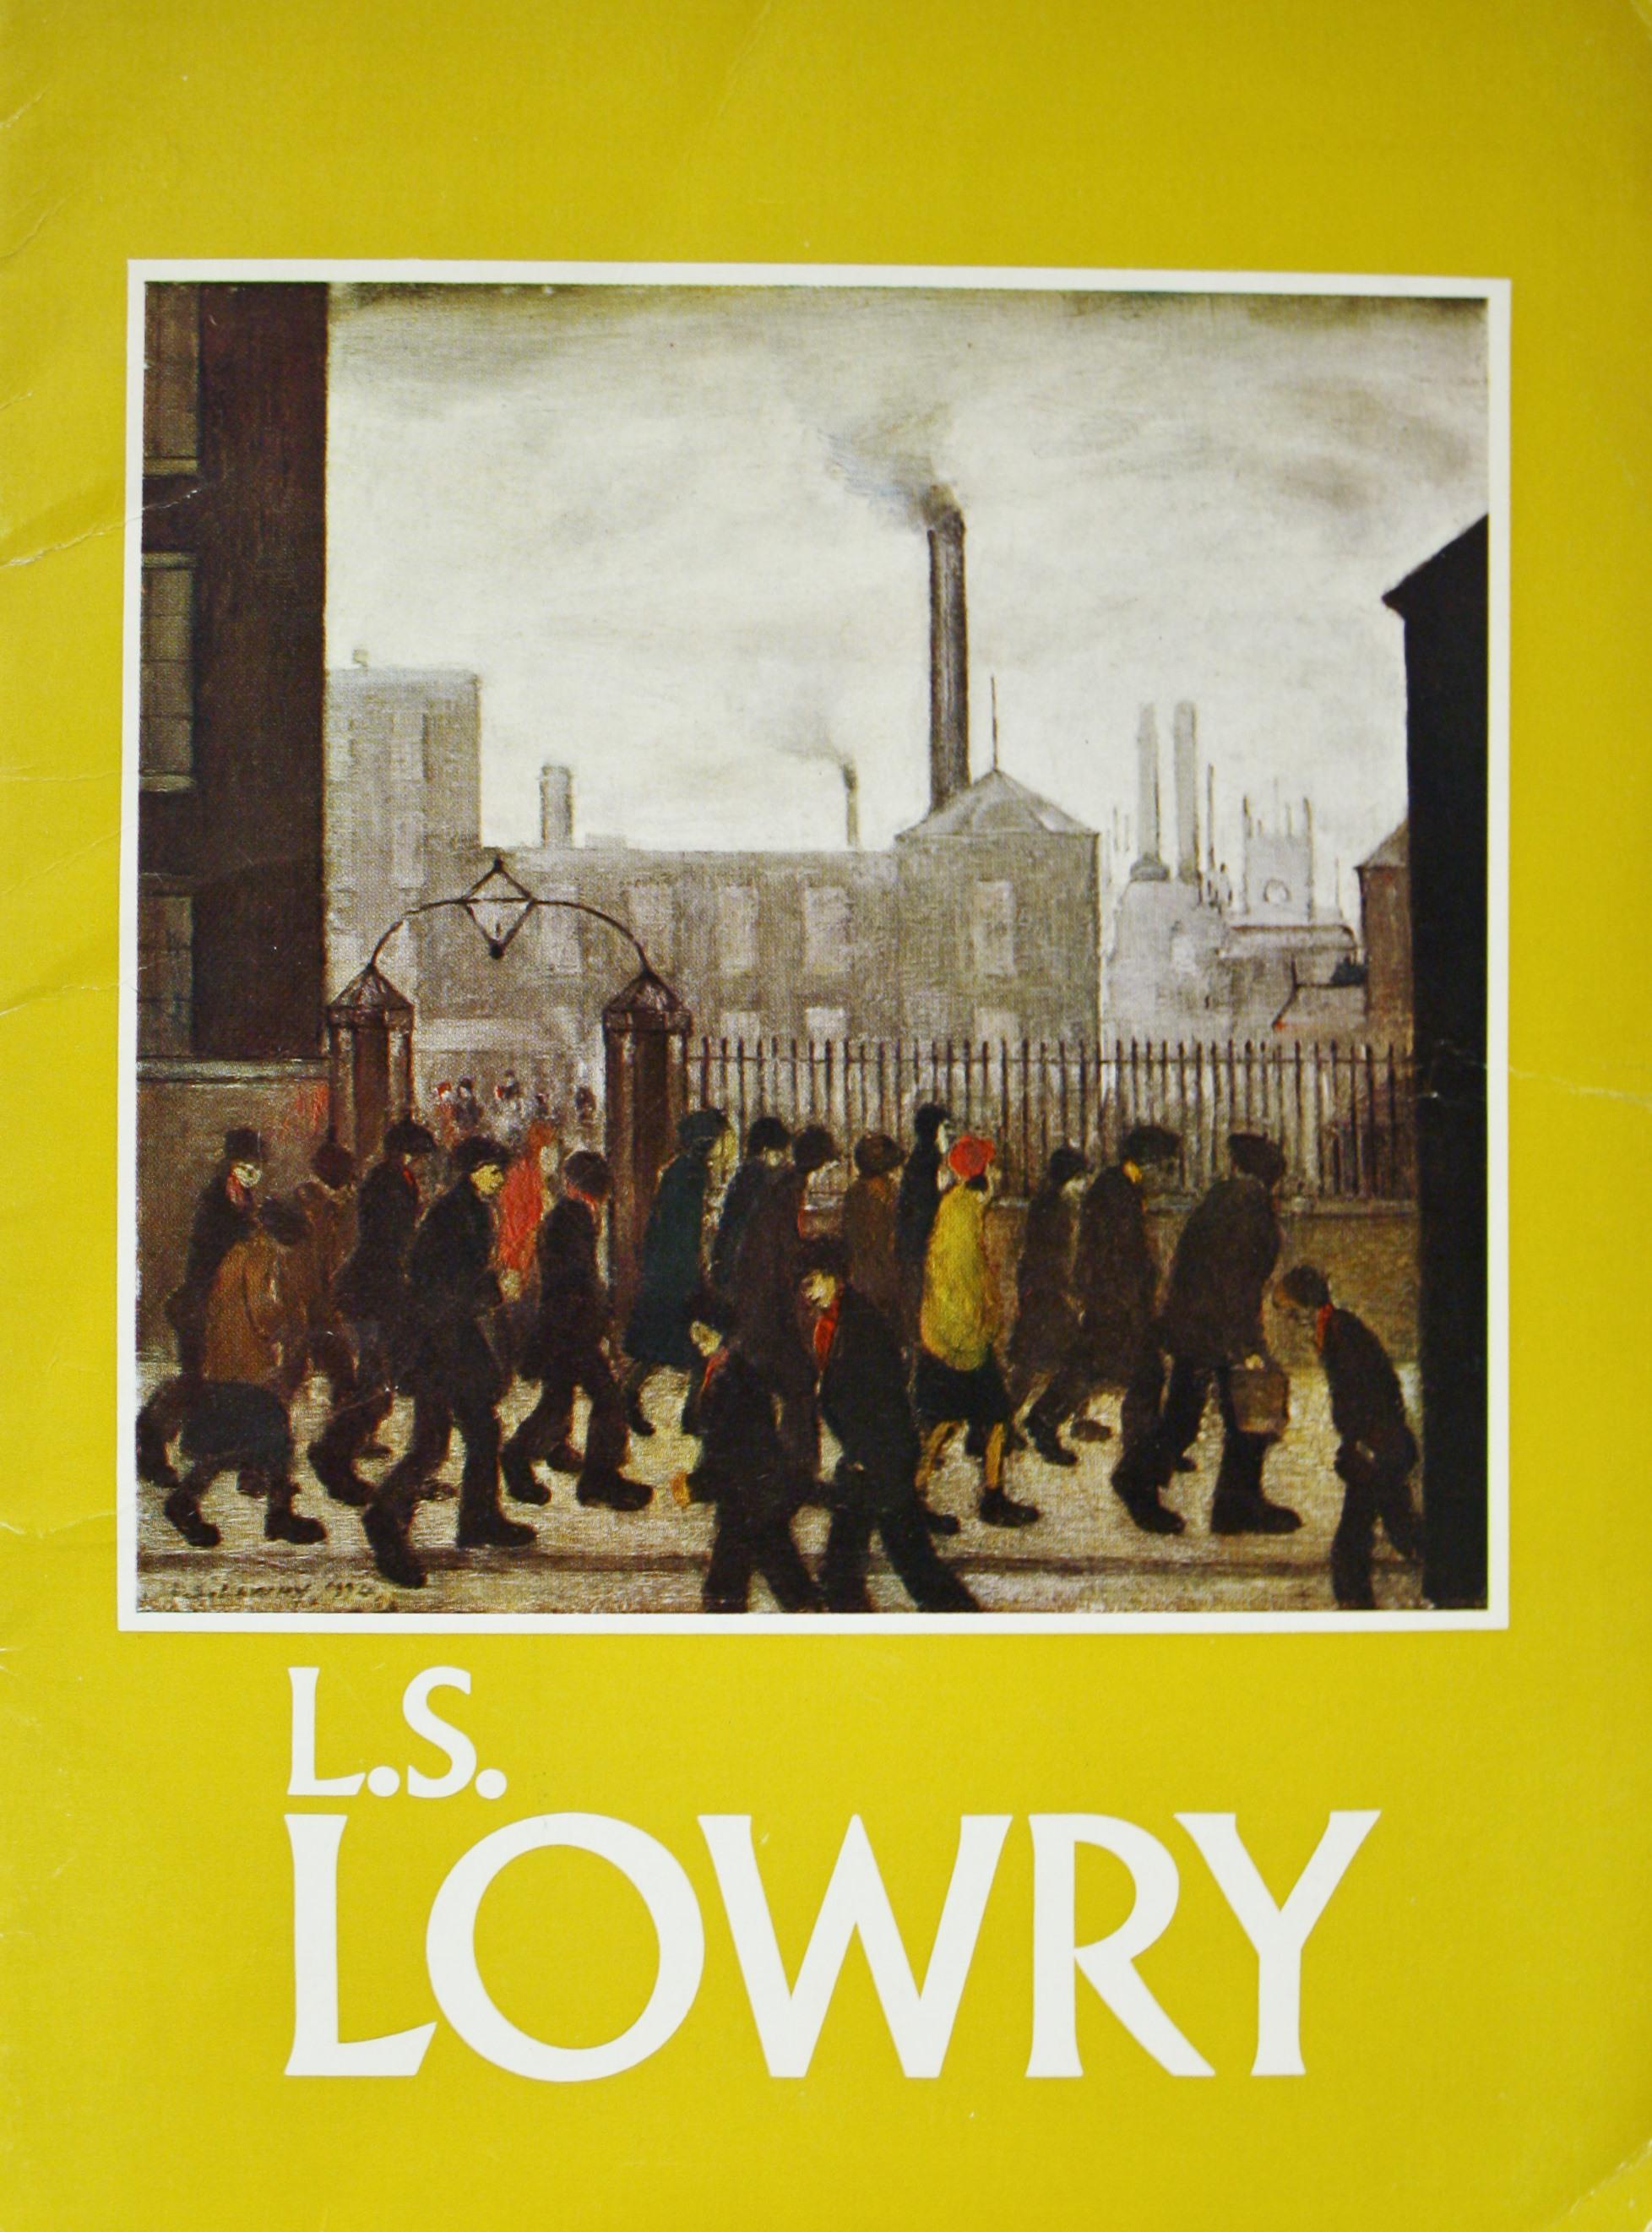 LS Lowry